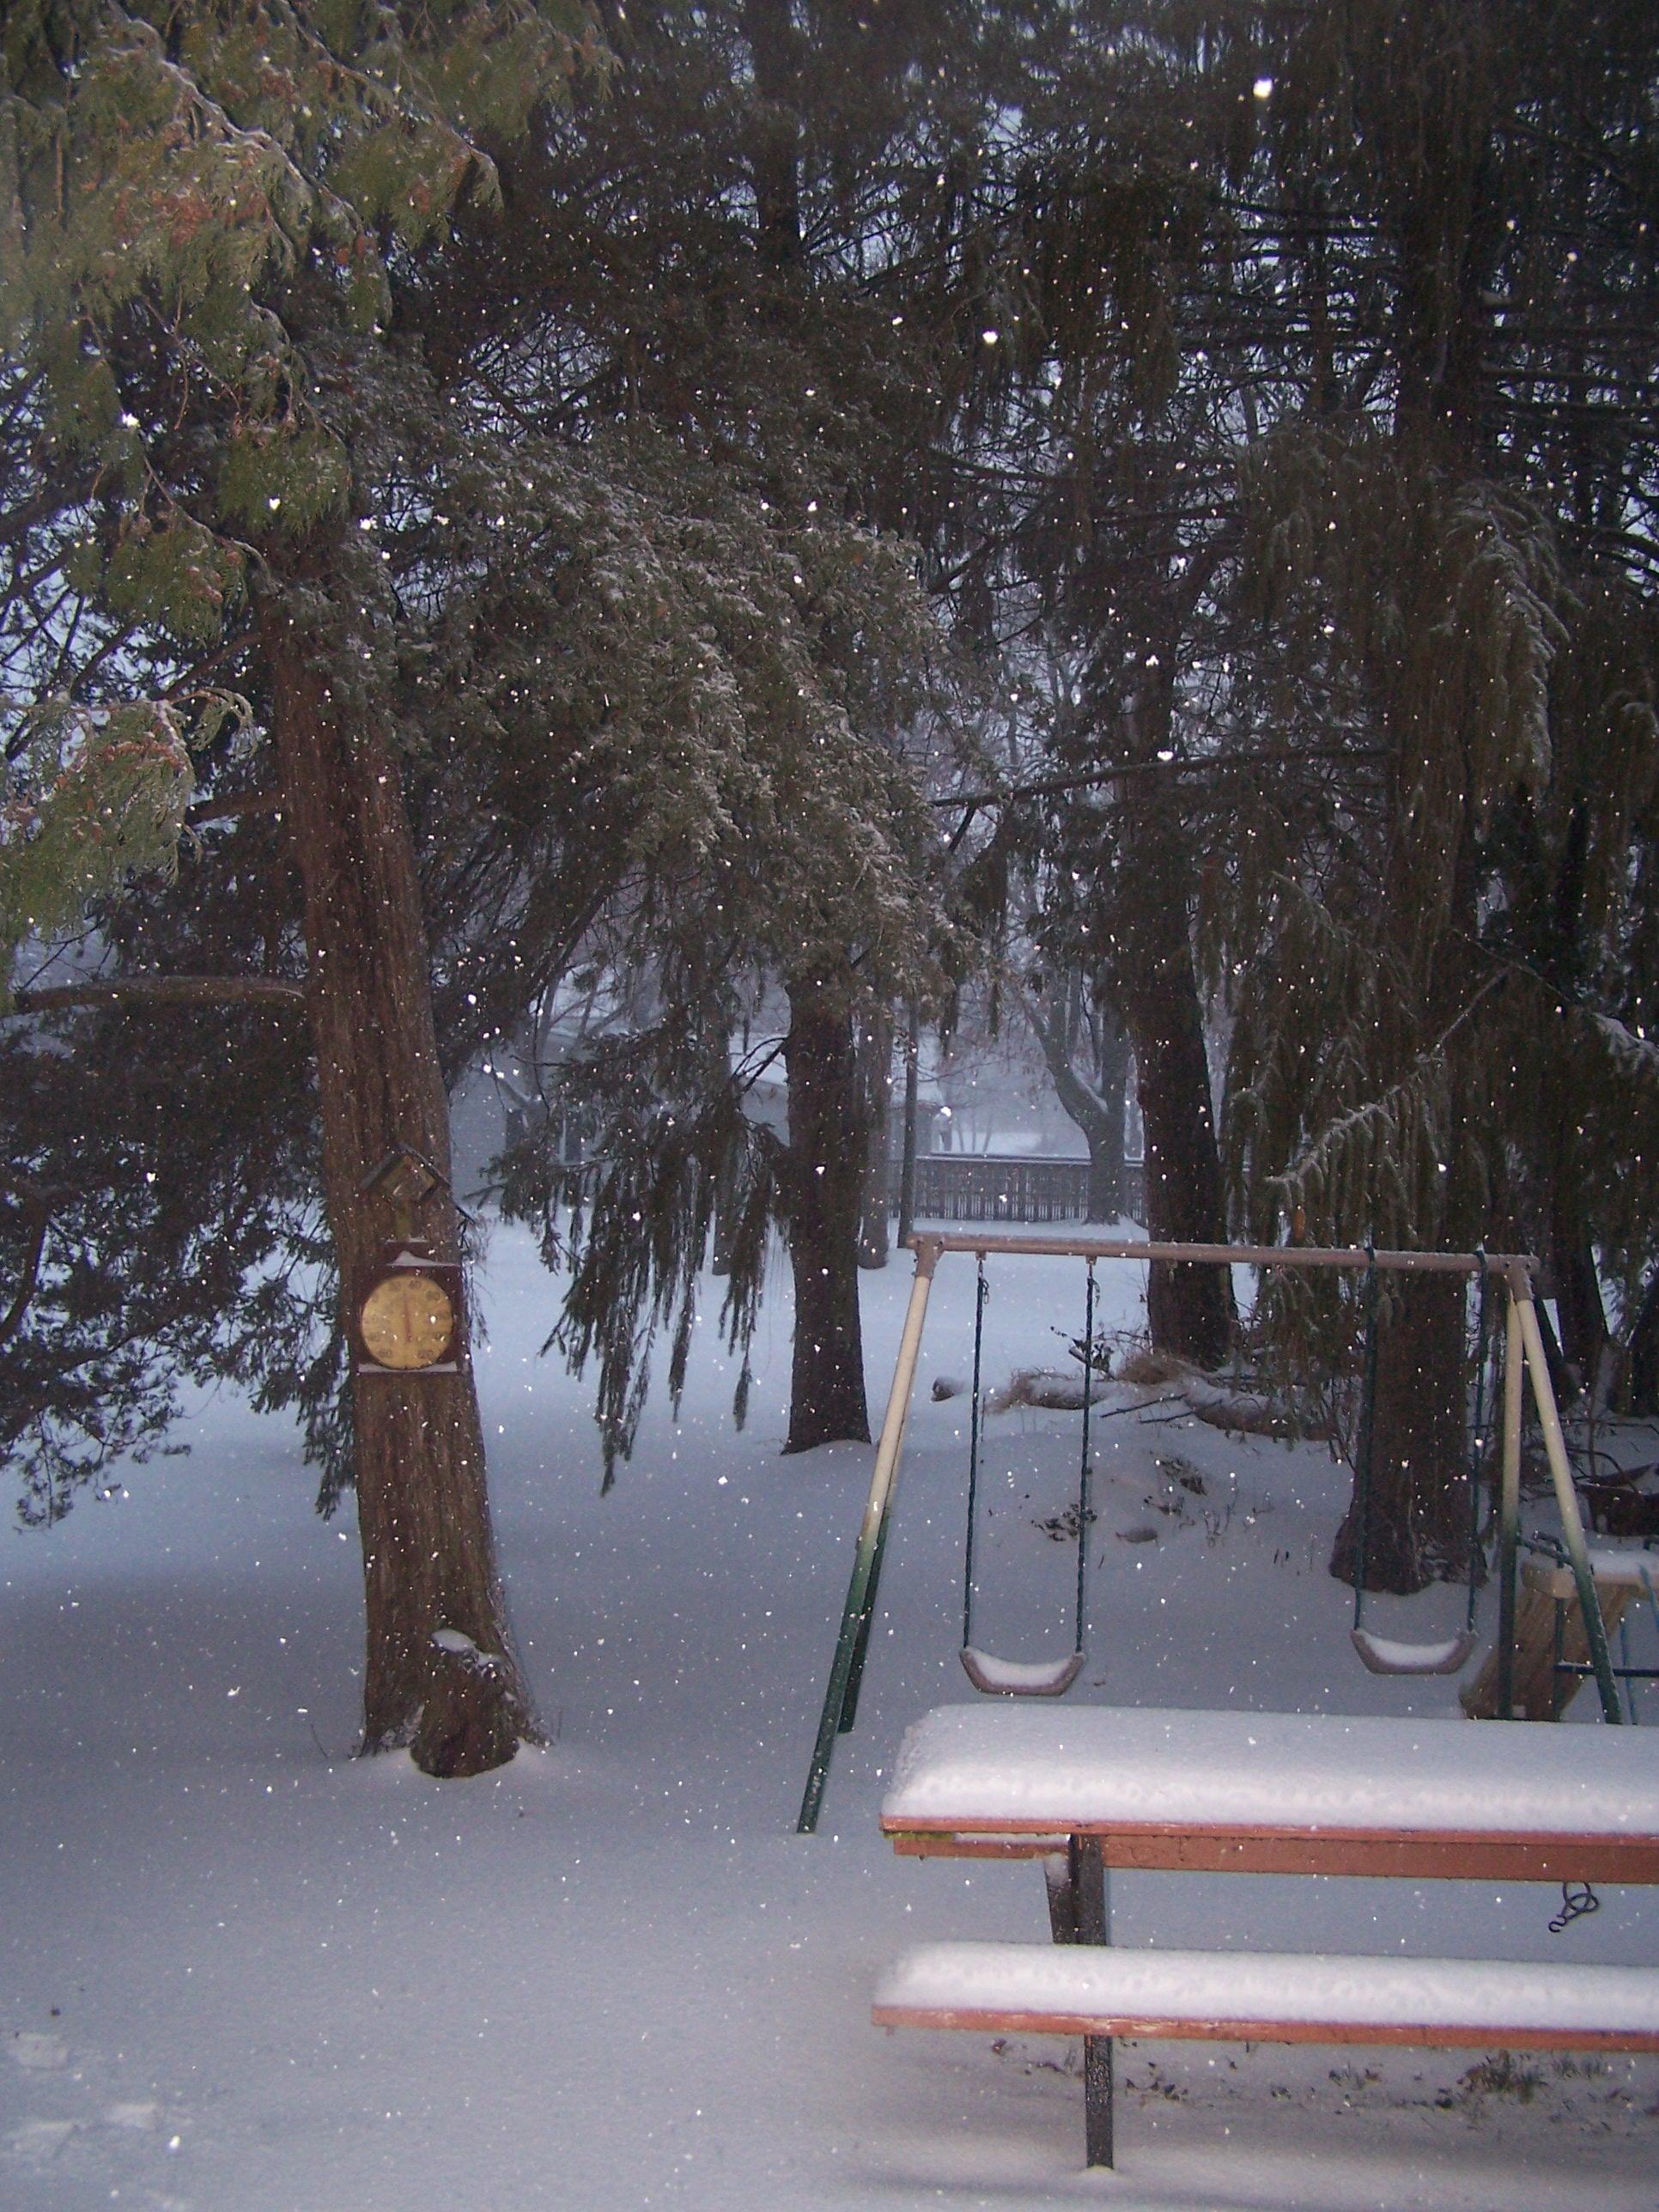 Our snowy back yard.